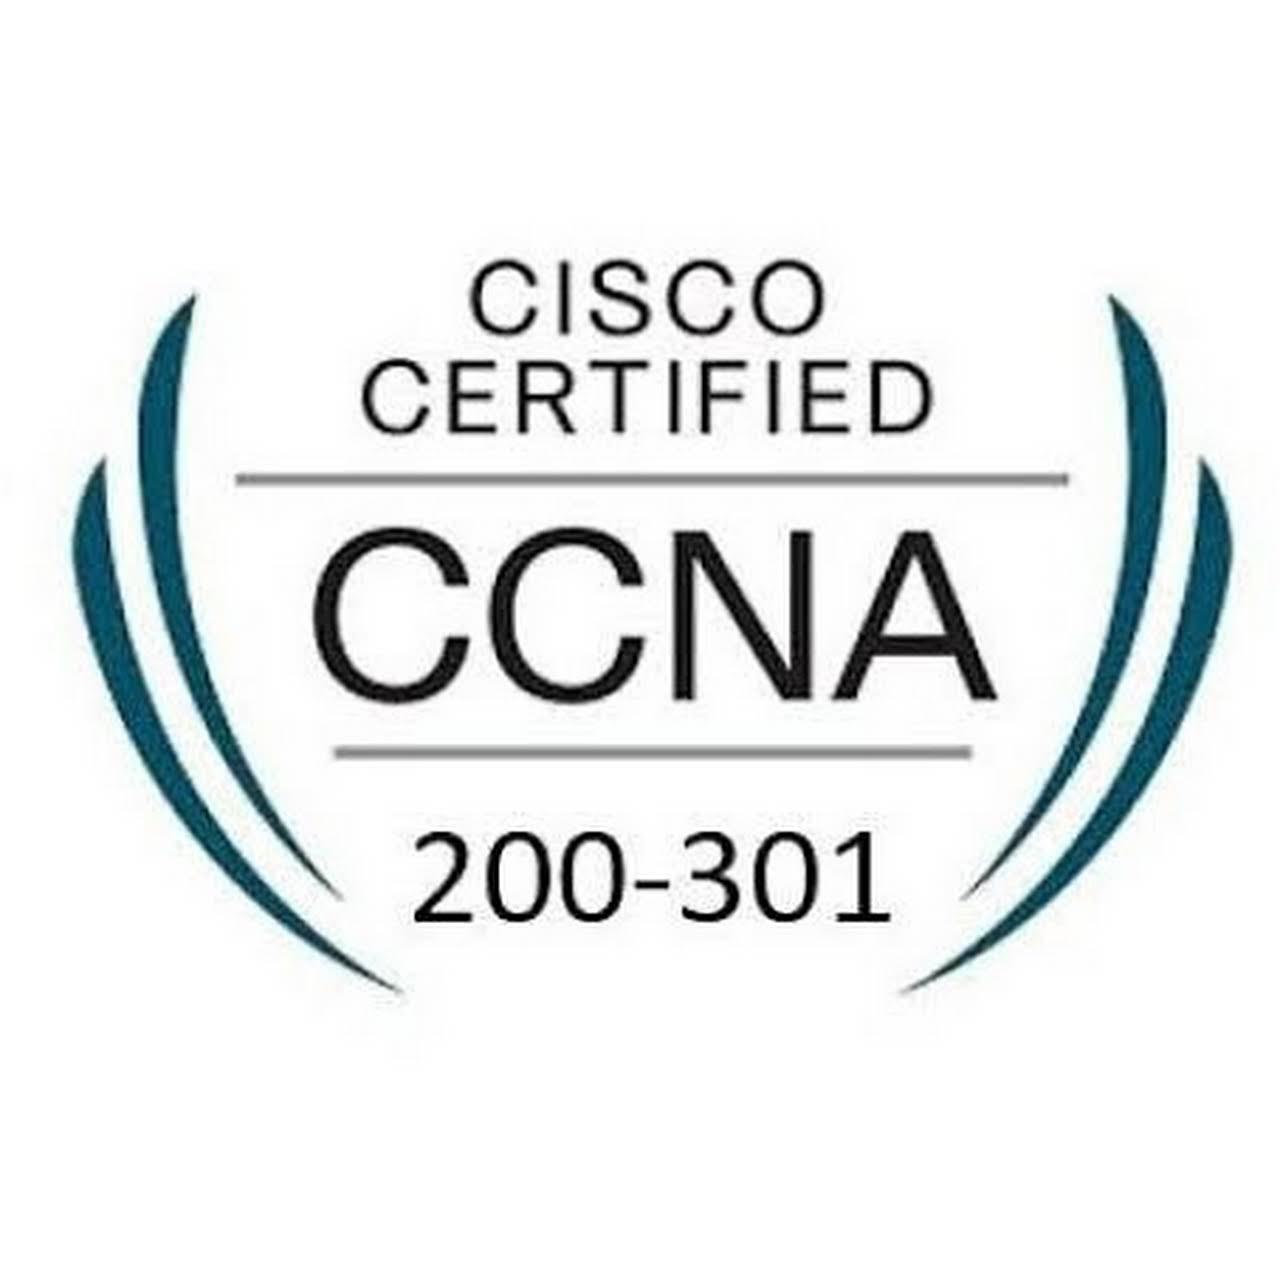 200-301 CCNA  logos